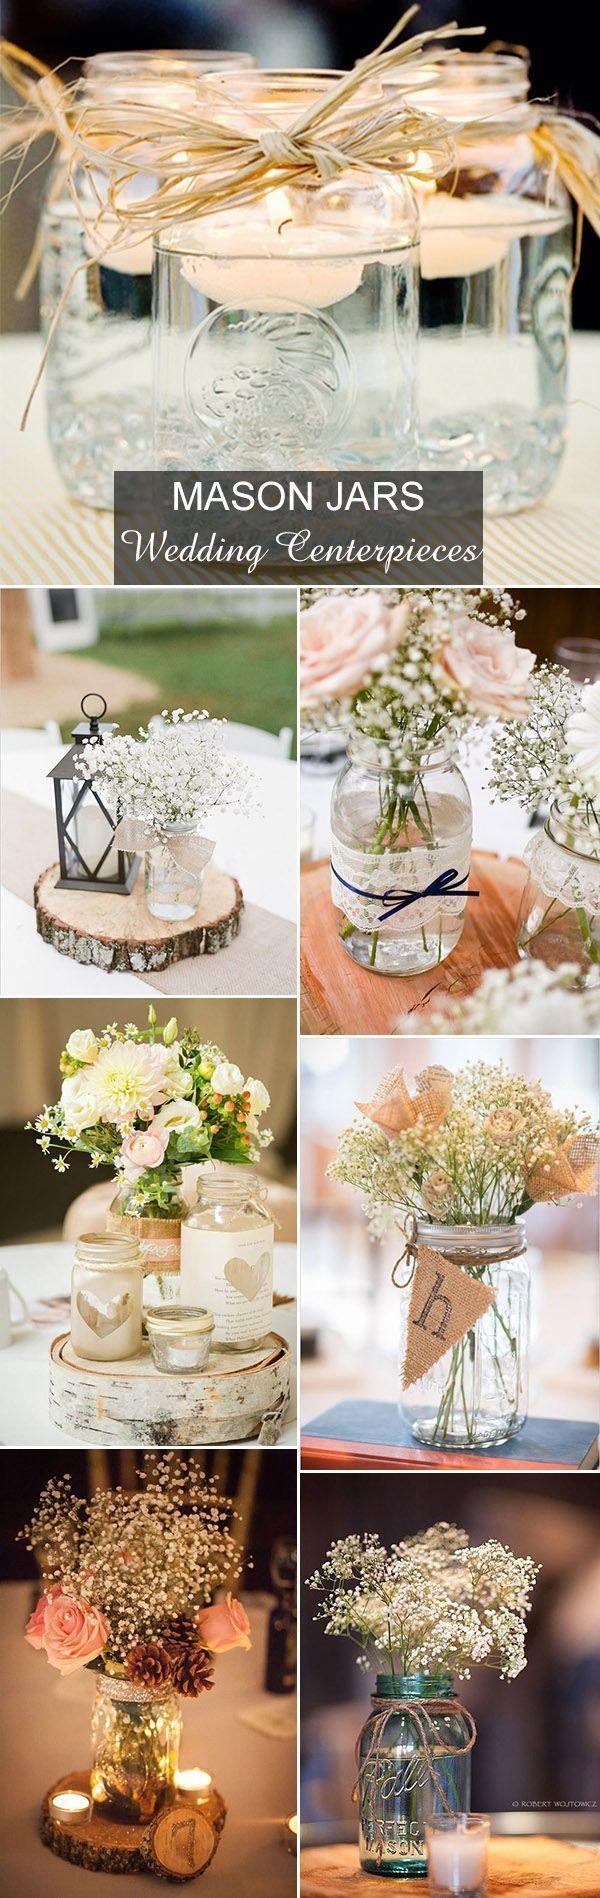 Best diy wedding decorations images on pinterest diy wedding